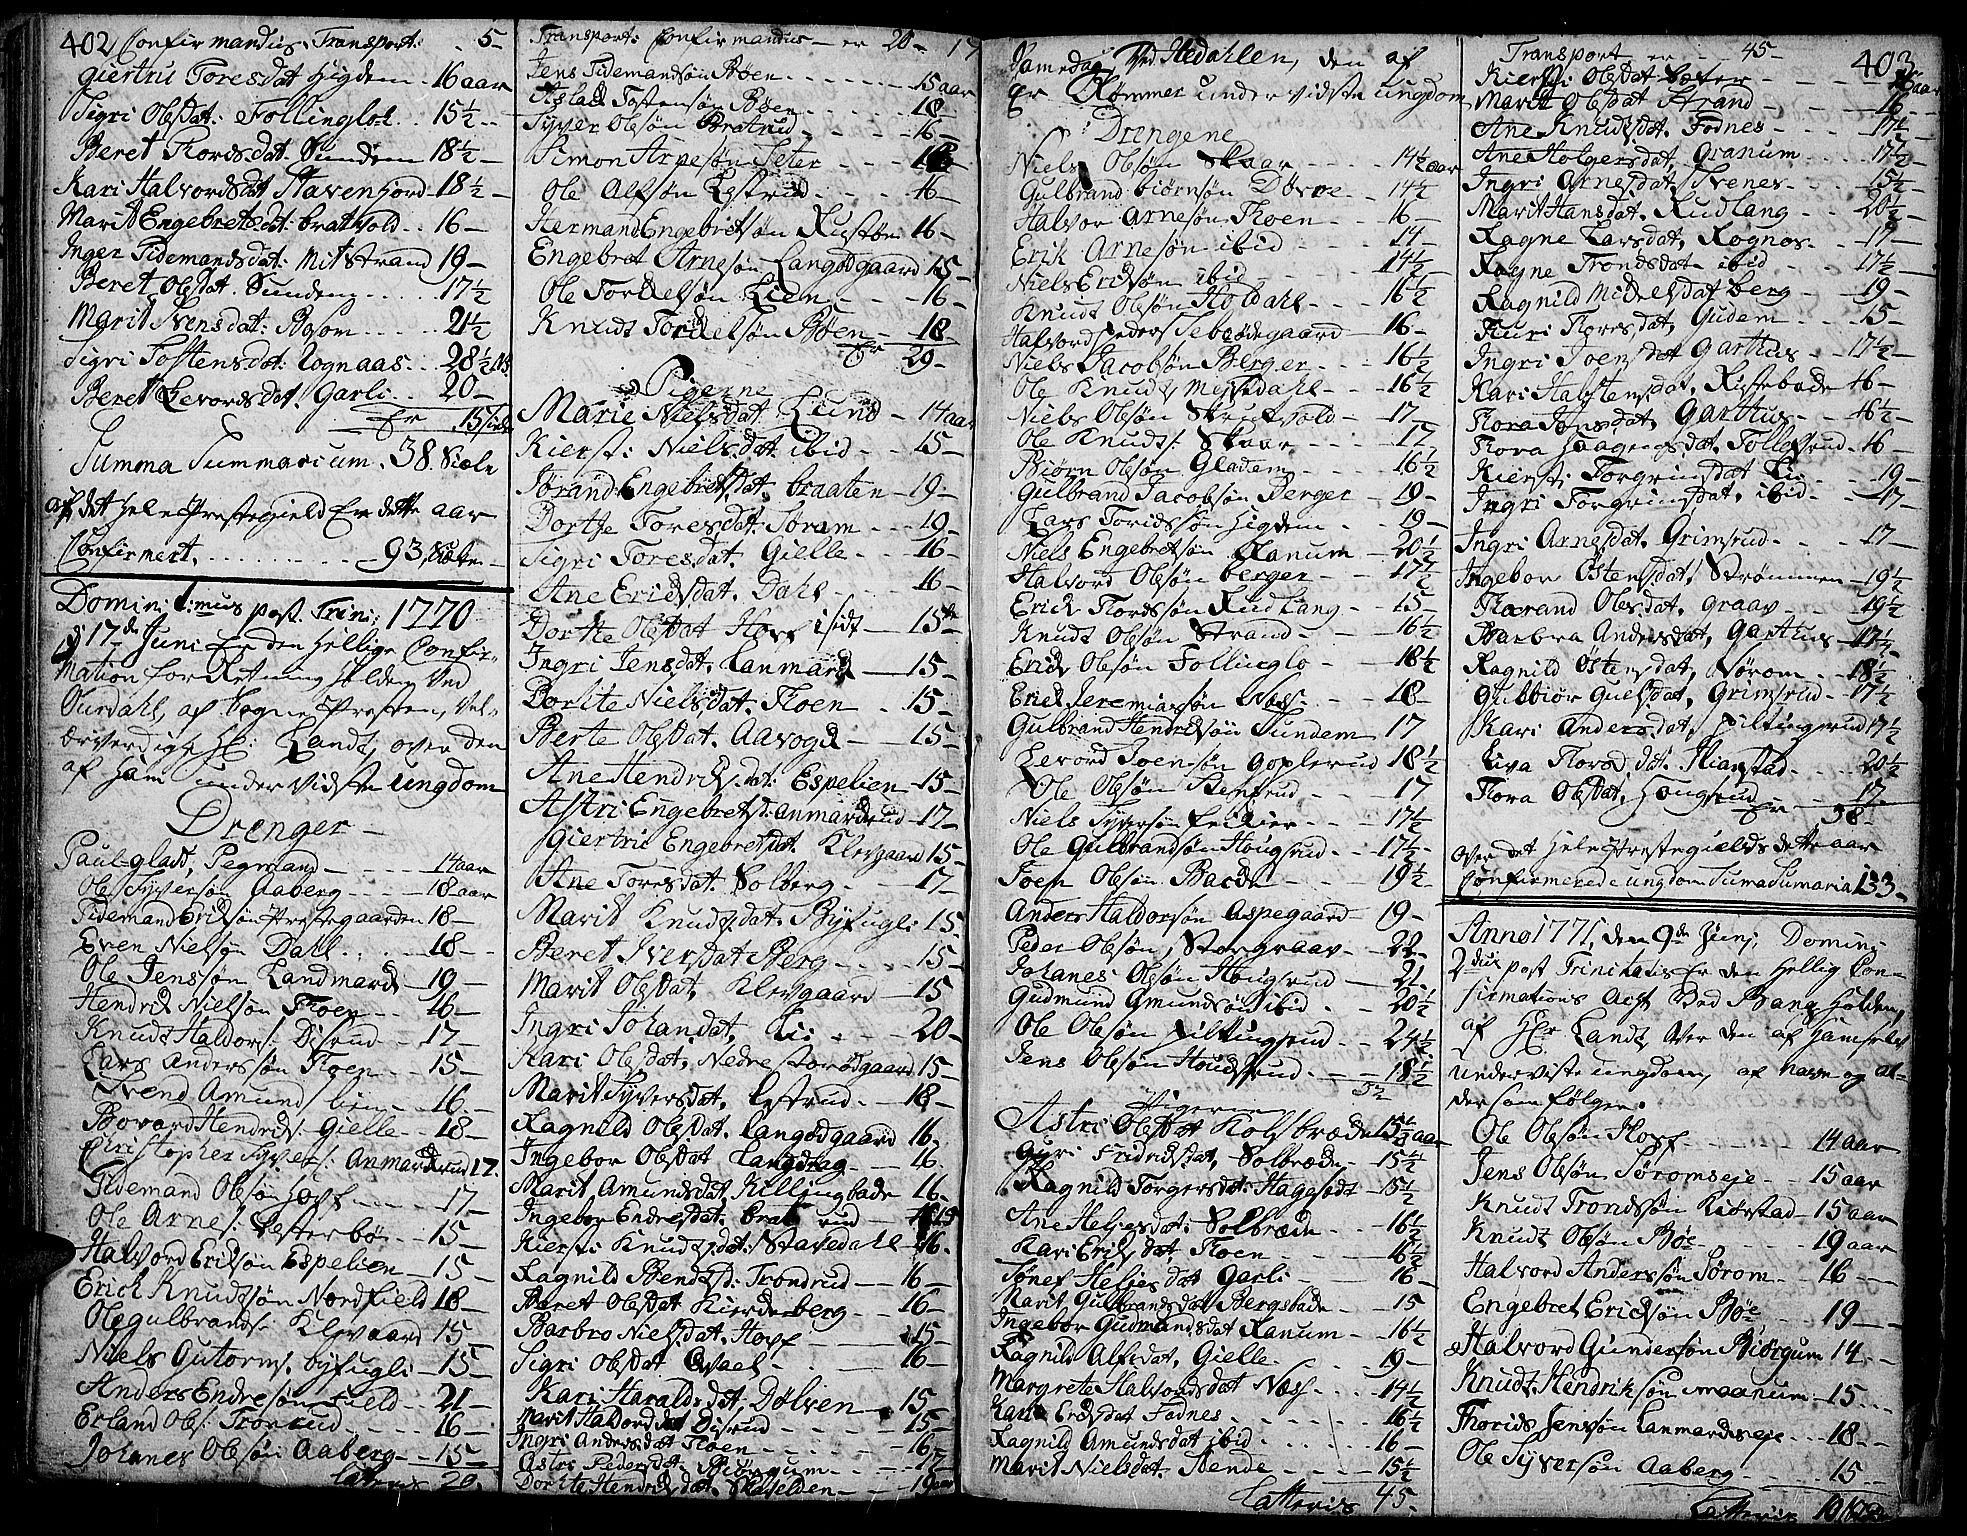 SAH, Aurdal prestekontor, Ministerialbok nr. 5, 1763-1781, s. 402-403